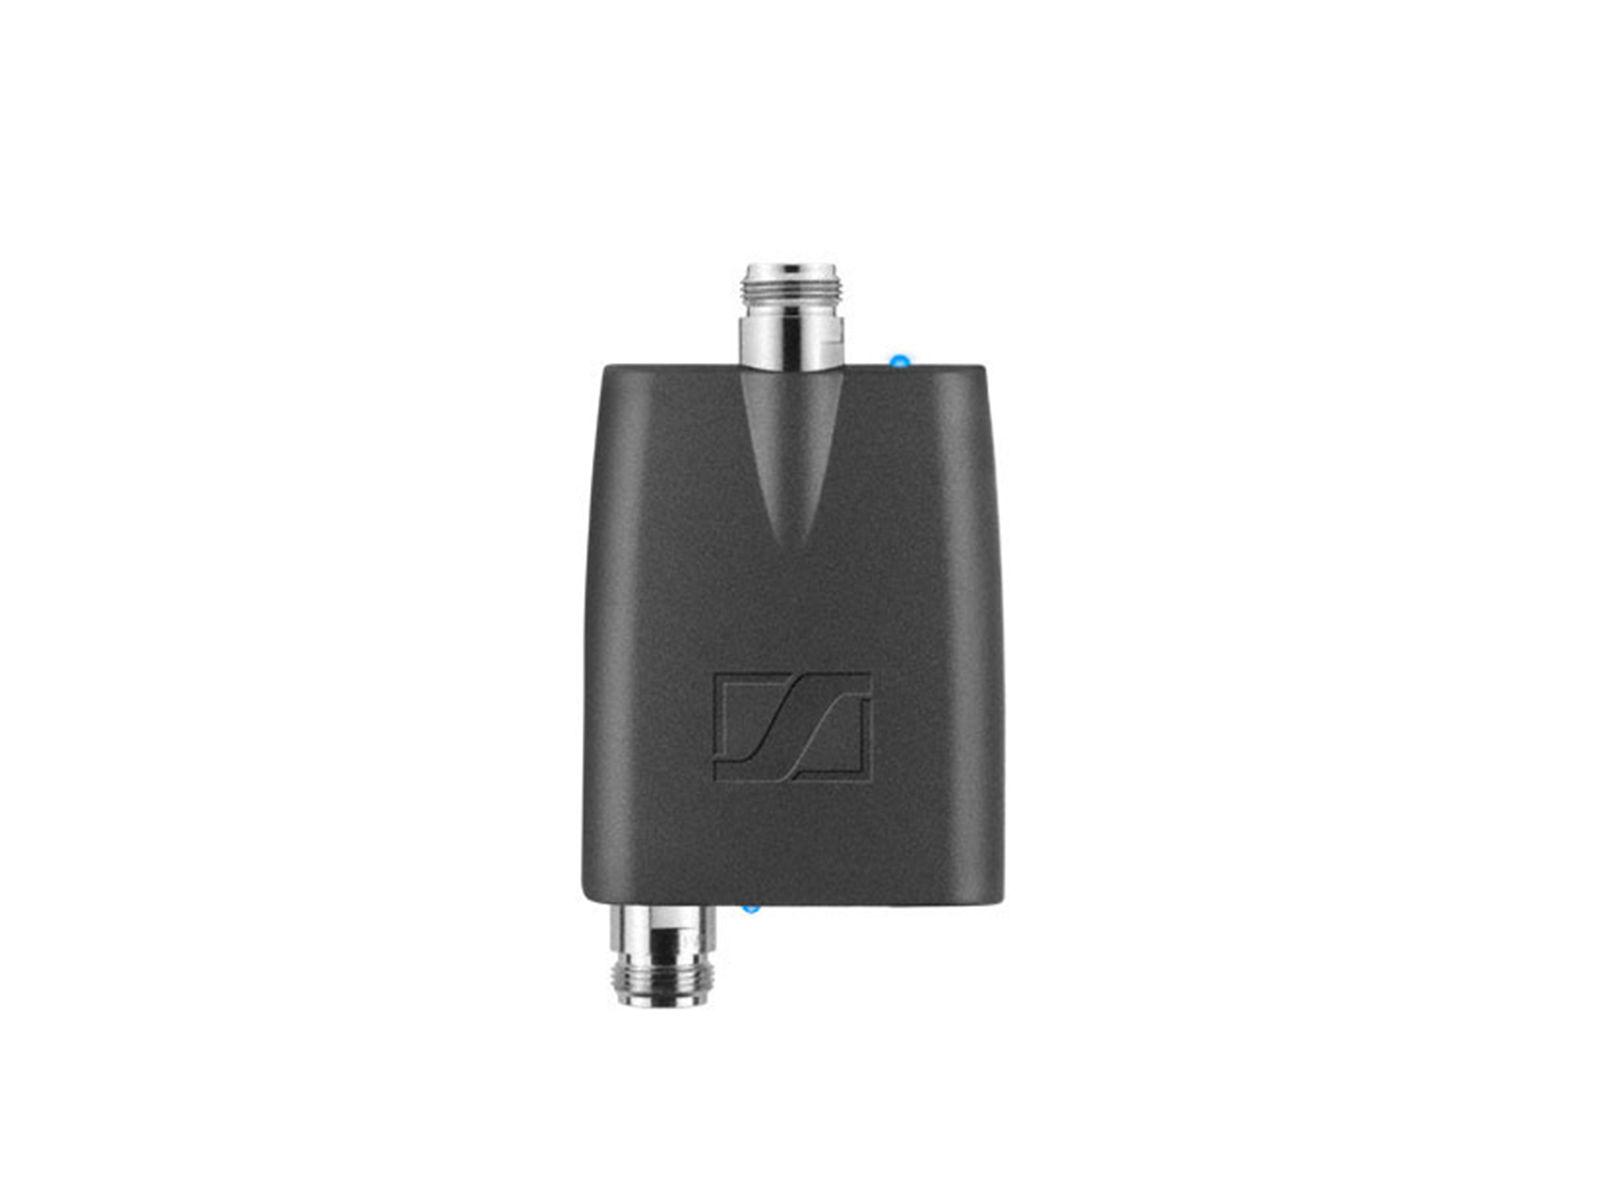 Sennheiser AB 9000 B1-B8 | Antennenverstärker, 630-798MHz, +17 dB, N-Anschluss